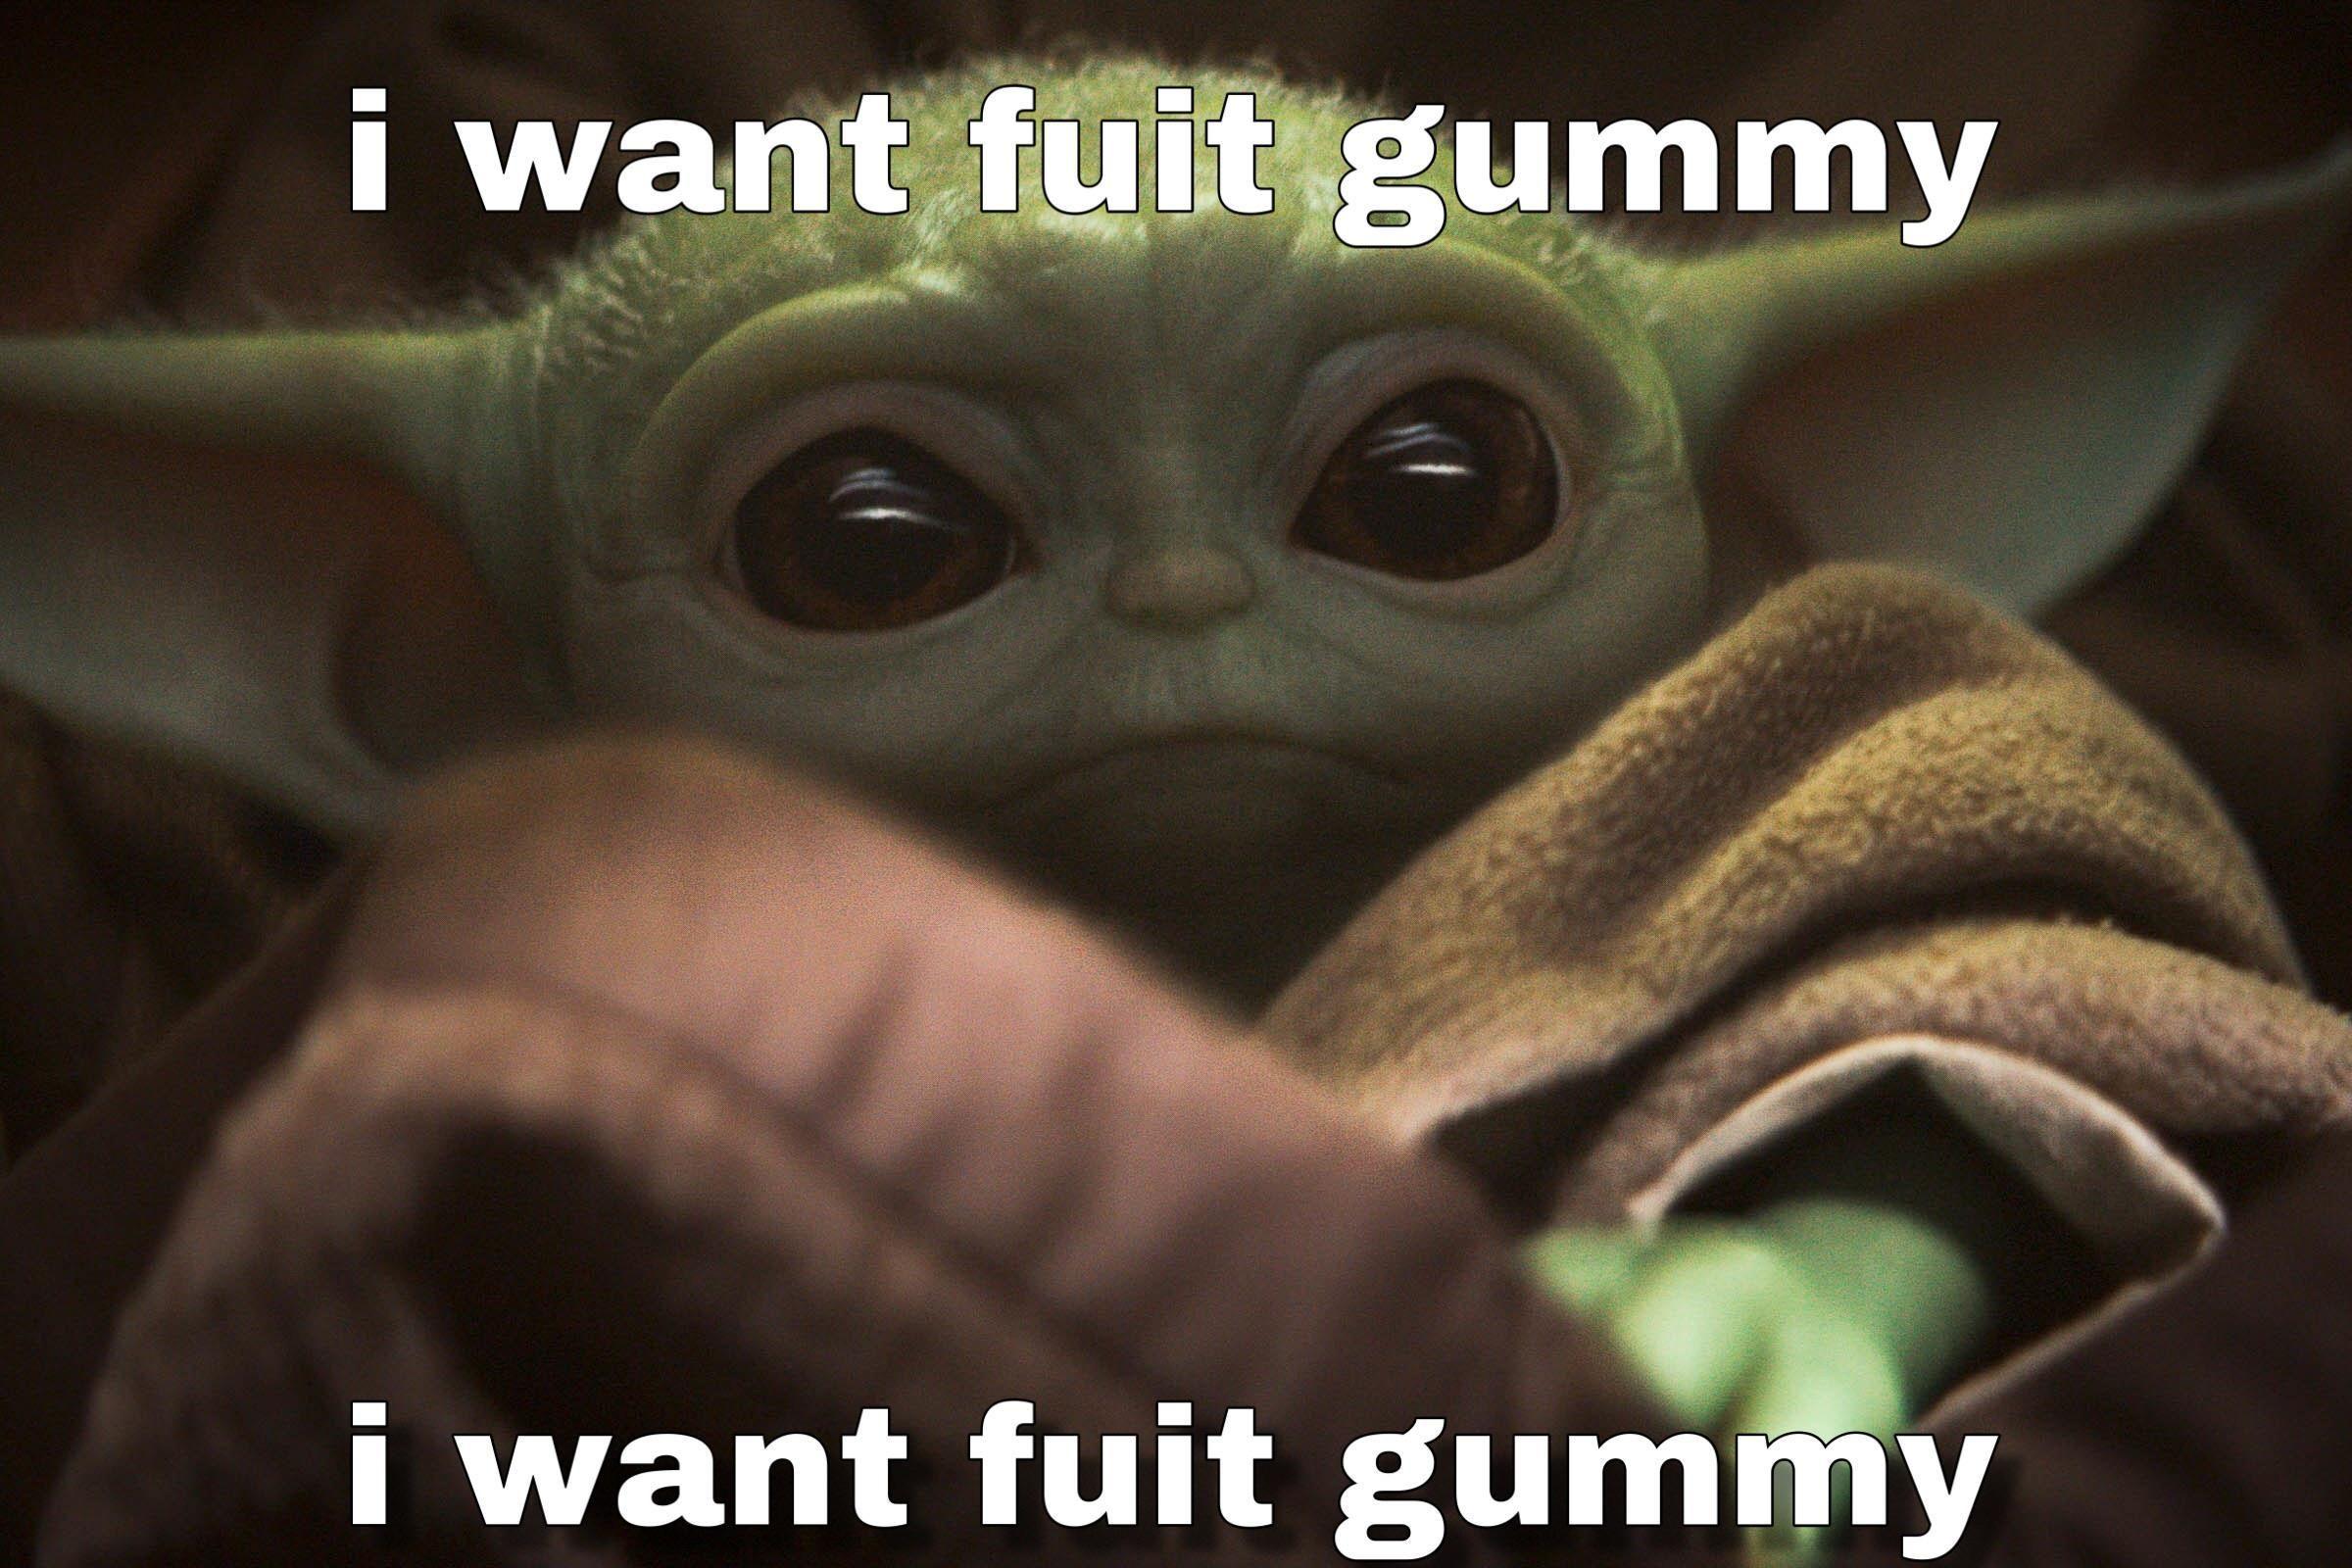 i want fuit gummy Yoda meme, Star wars, Bored panda